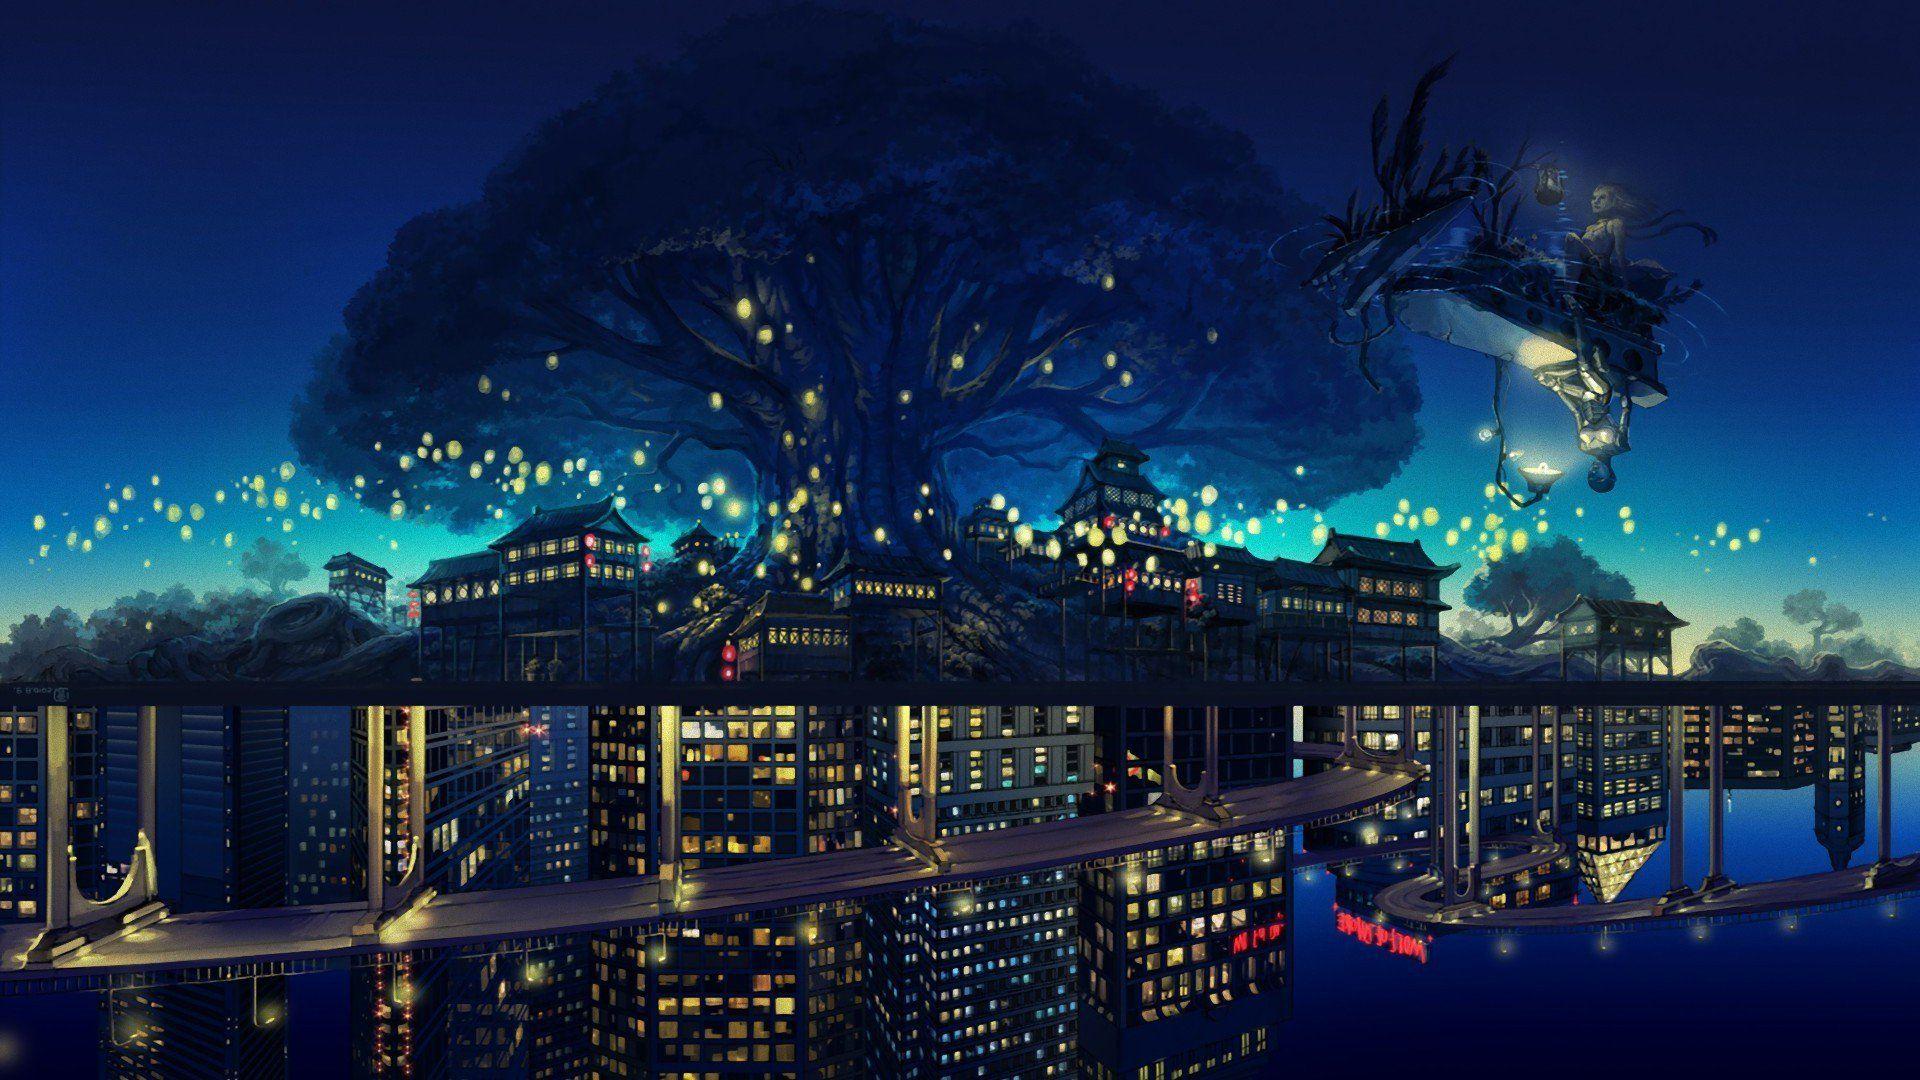 Imgur Anime City Anime Scenery Wallpaper Anime Backgrounds Wallpapers